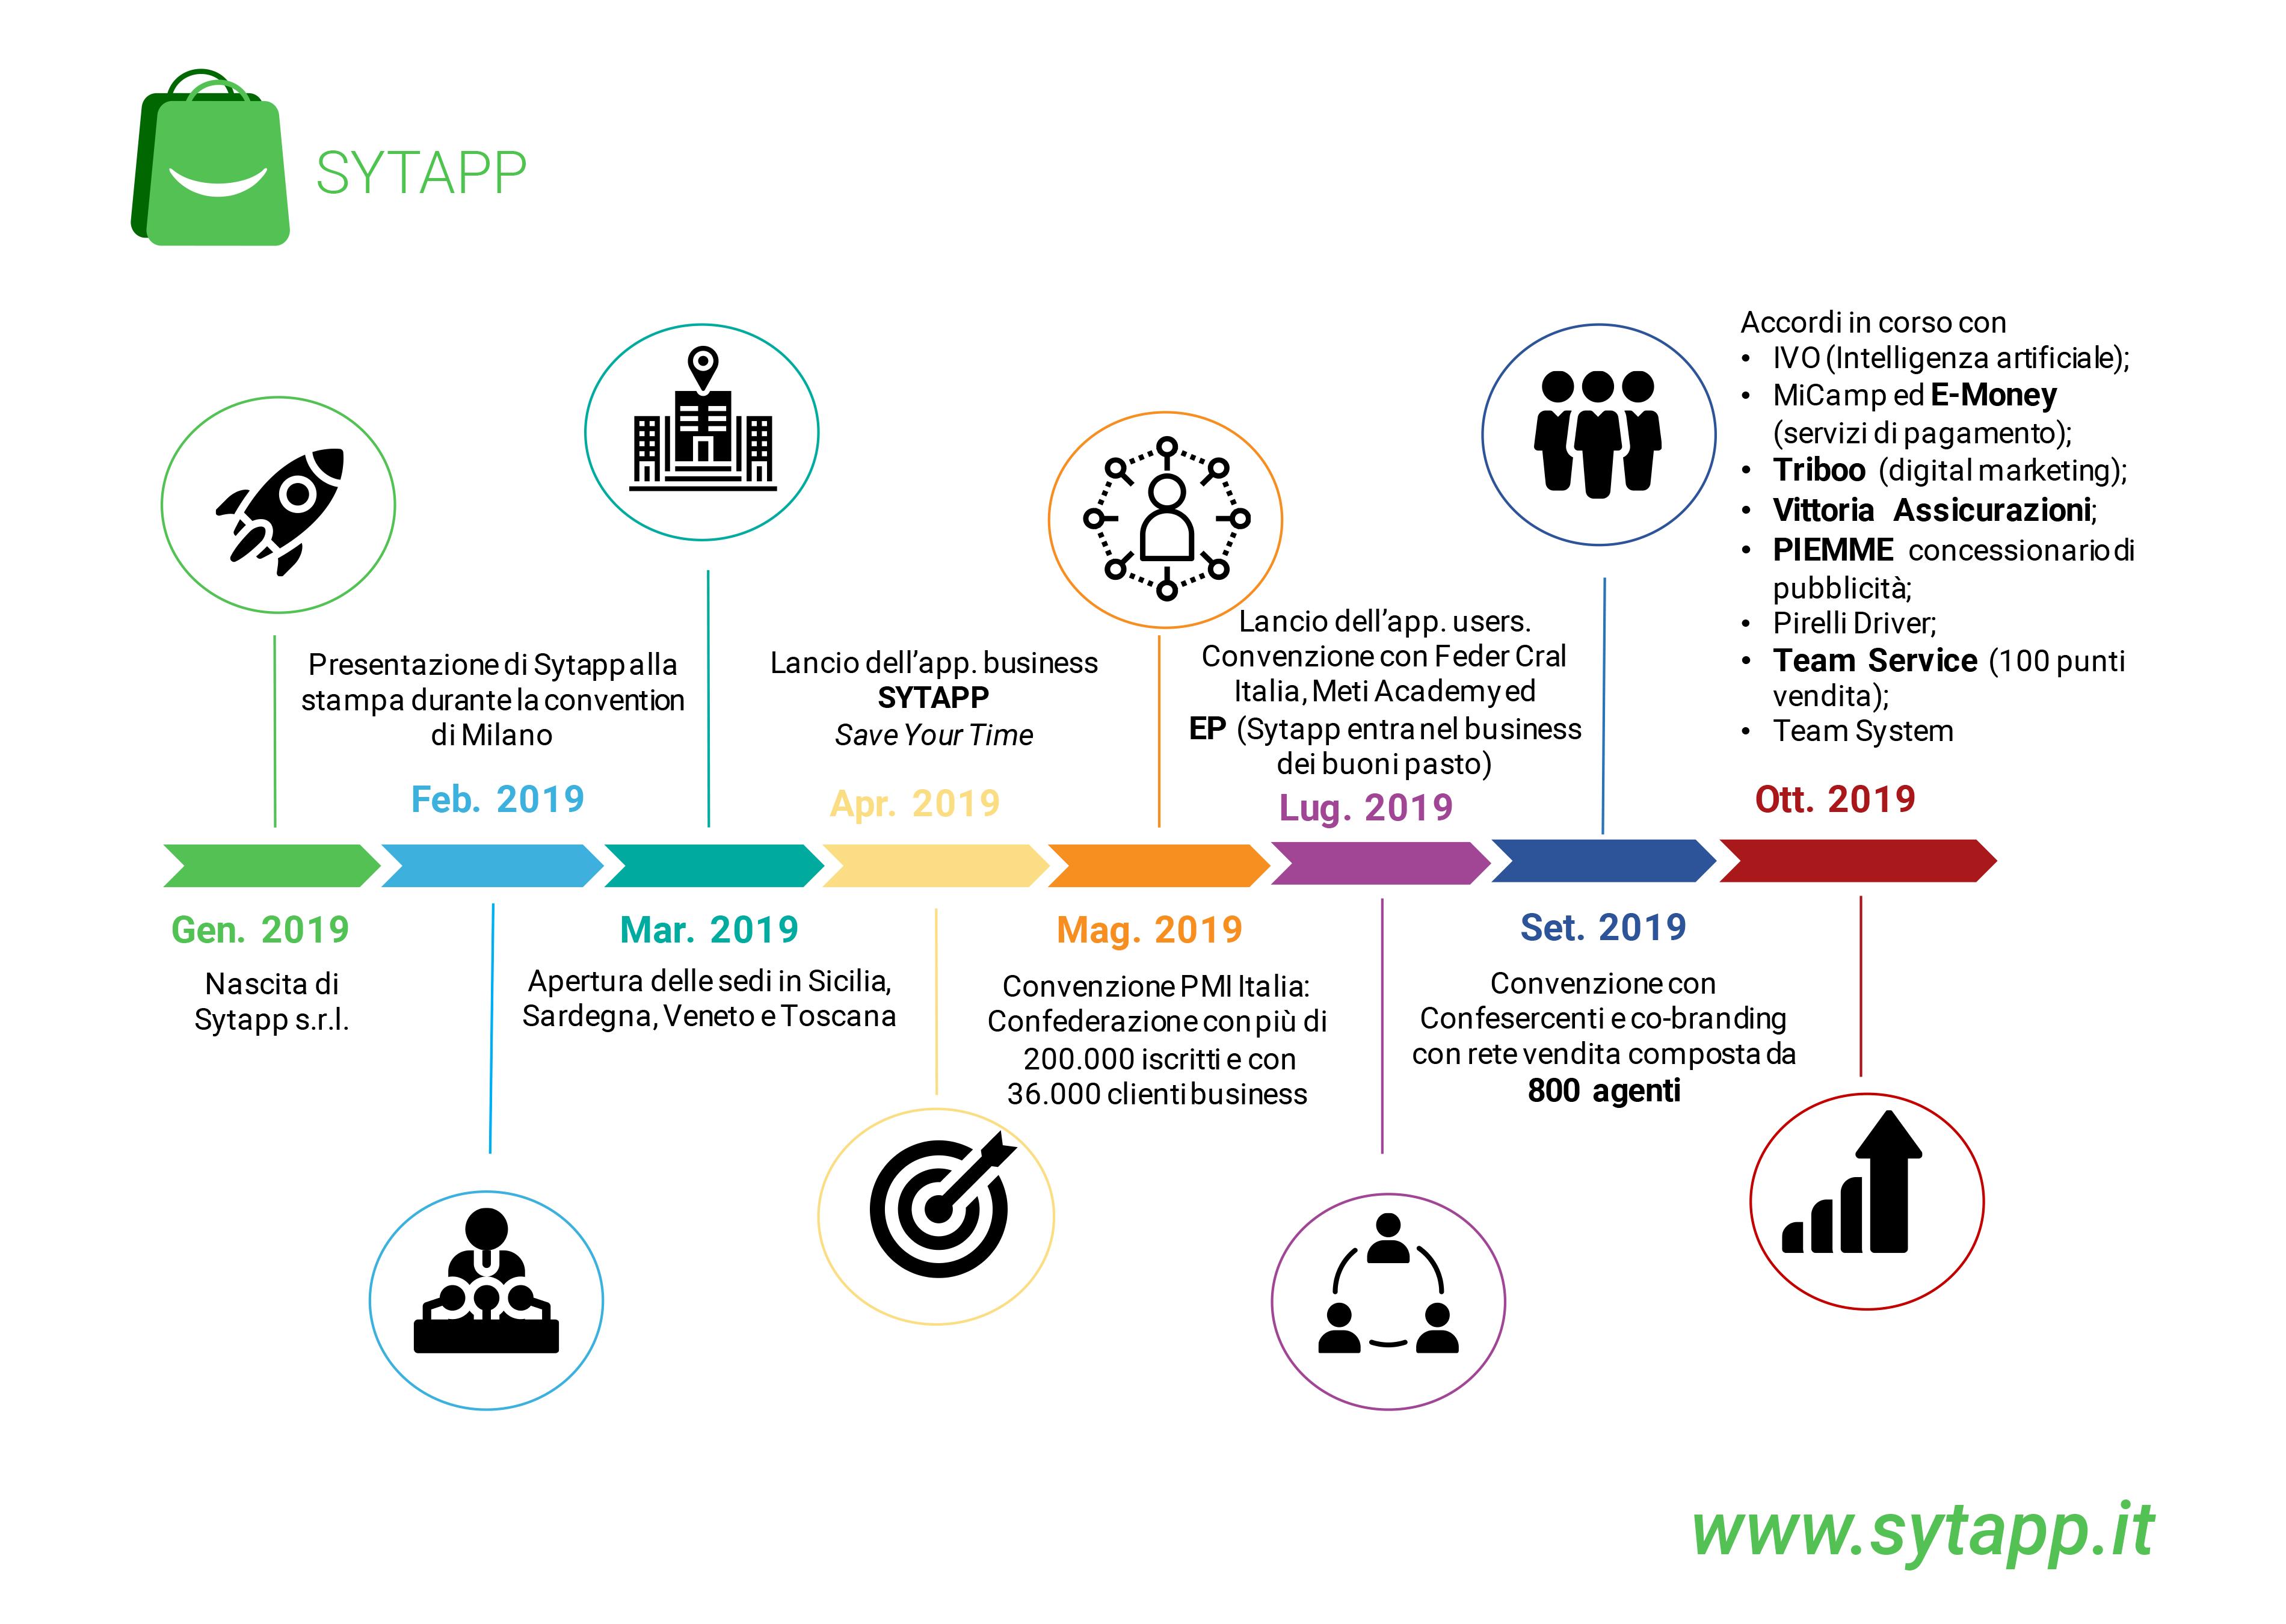 sytapp-timeline-per-Claudio